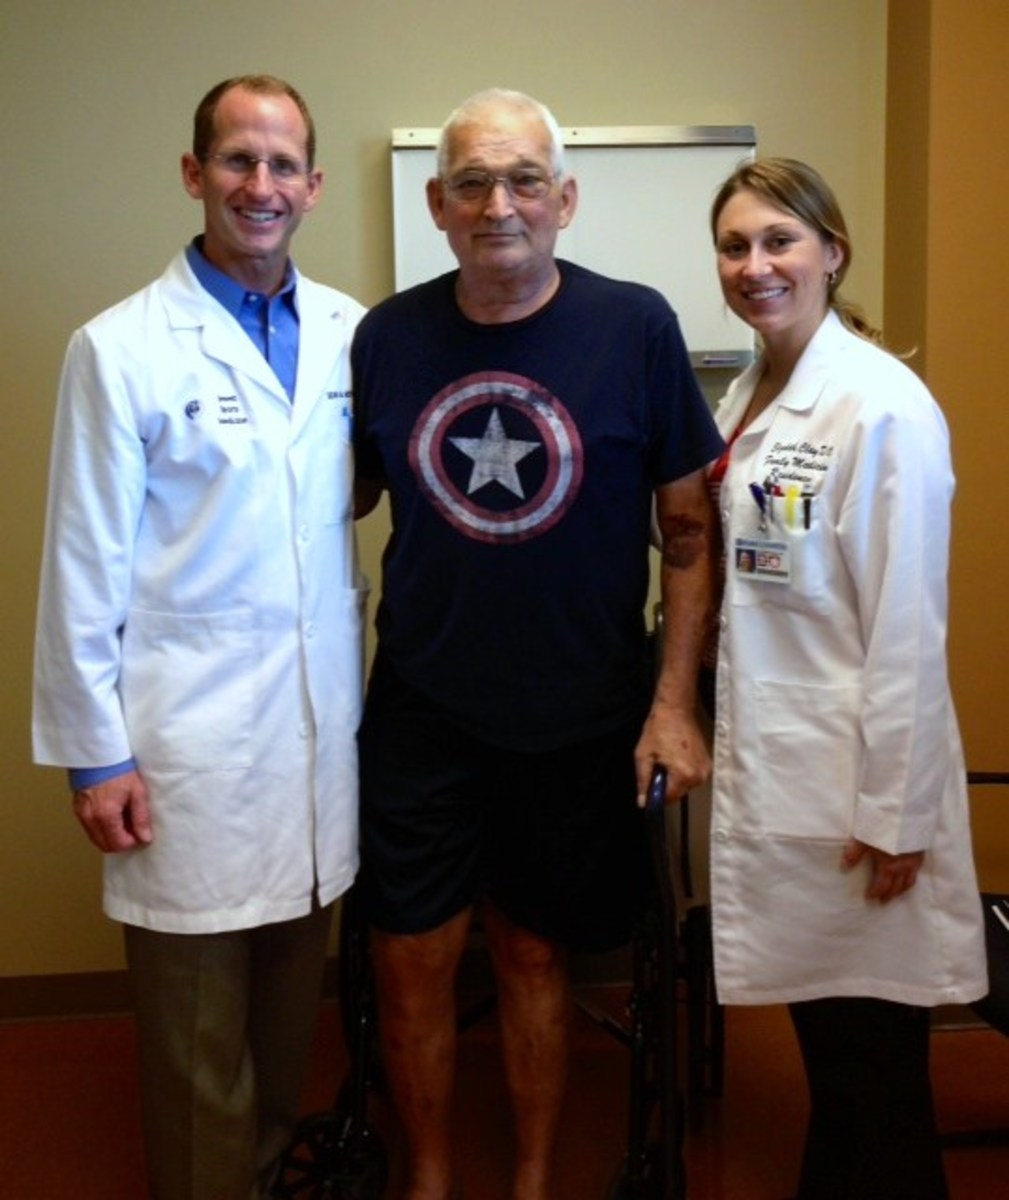 Jewett Orthopaedic Clinic of Orlando, Florida